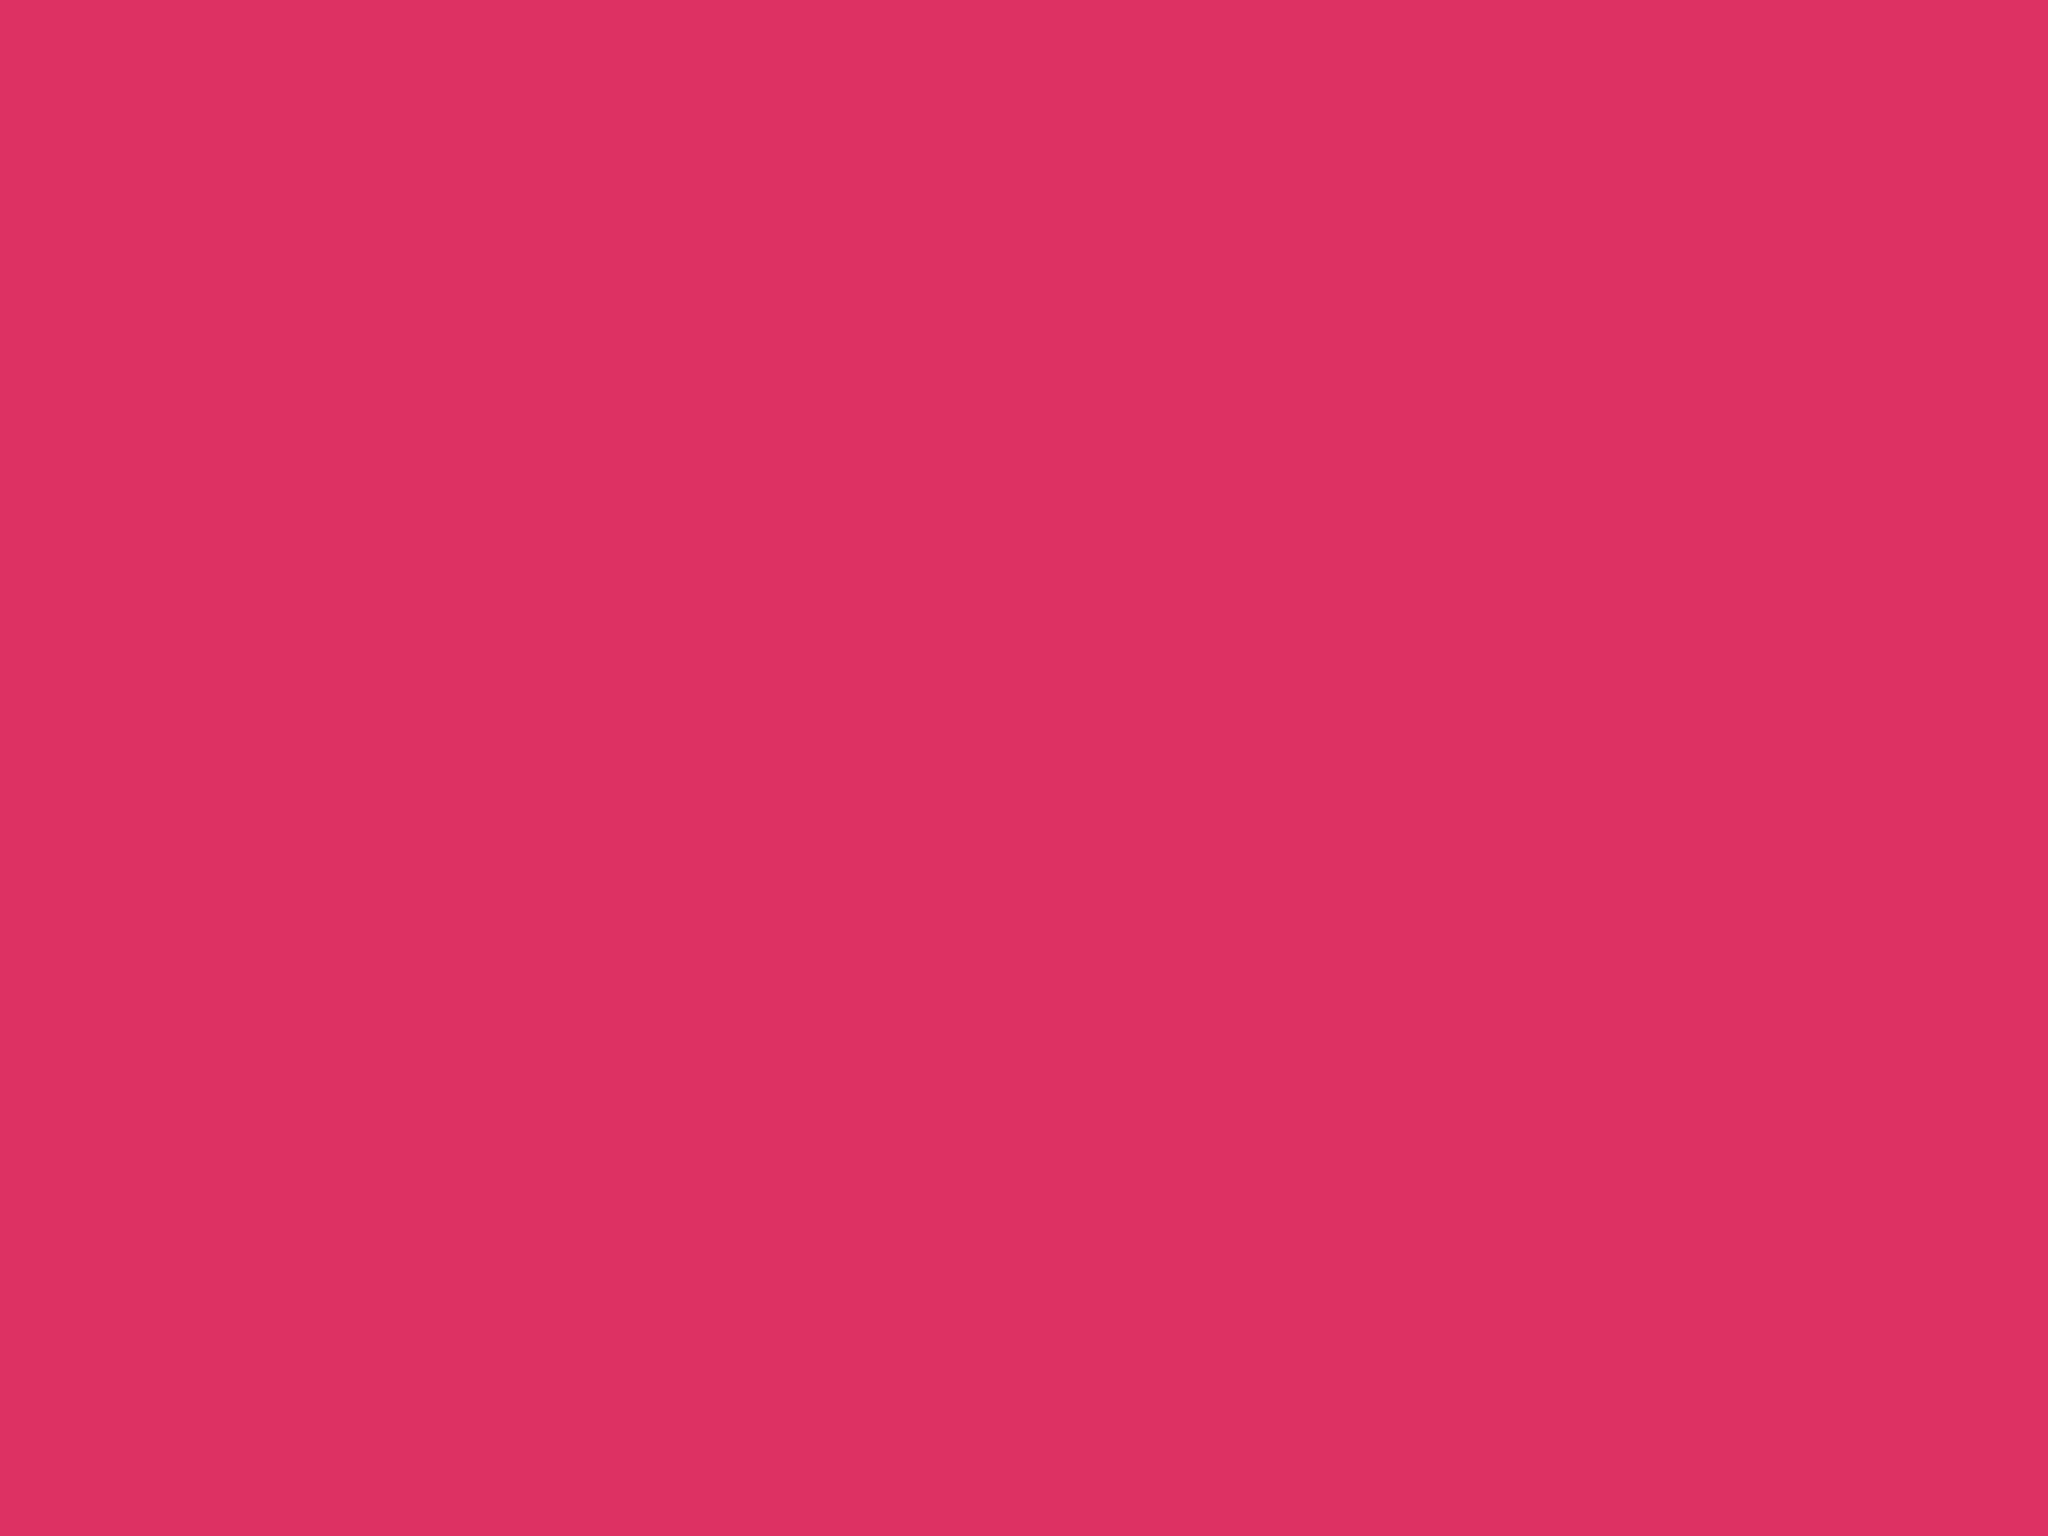 2048x1536 Cerise Solid Color Background